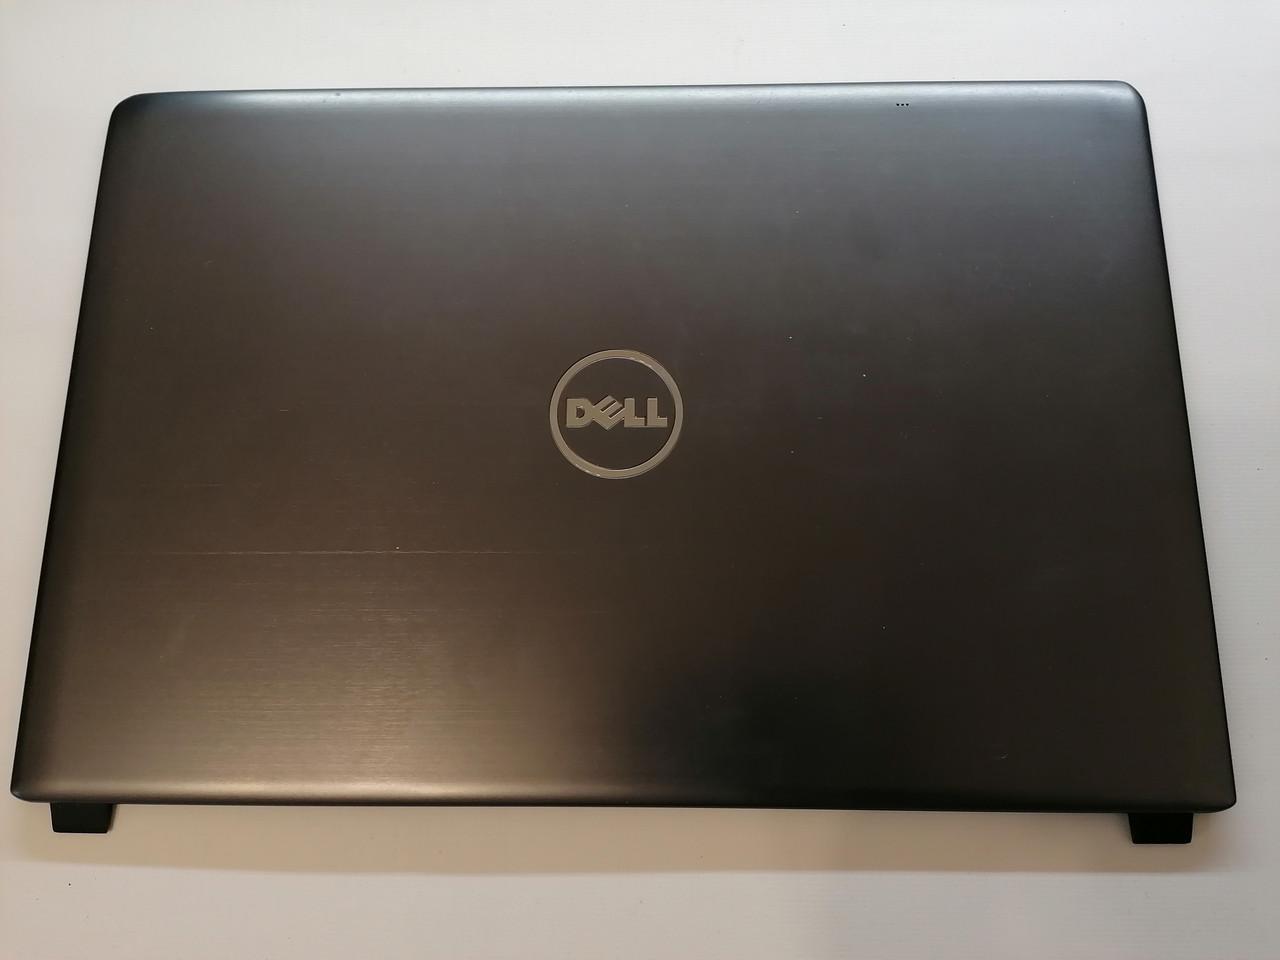 Б/У корпус крышка матрицы для ноутбука Dell Vostro V5460, 5460, V5470, 5470, V5480, 5480